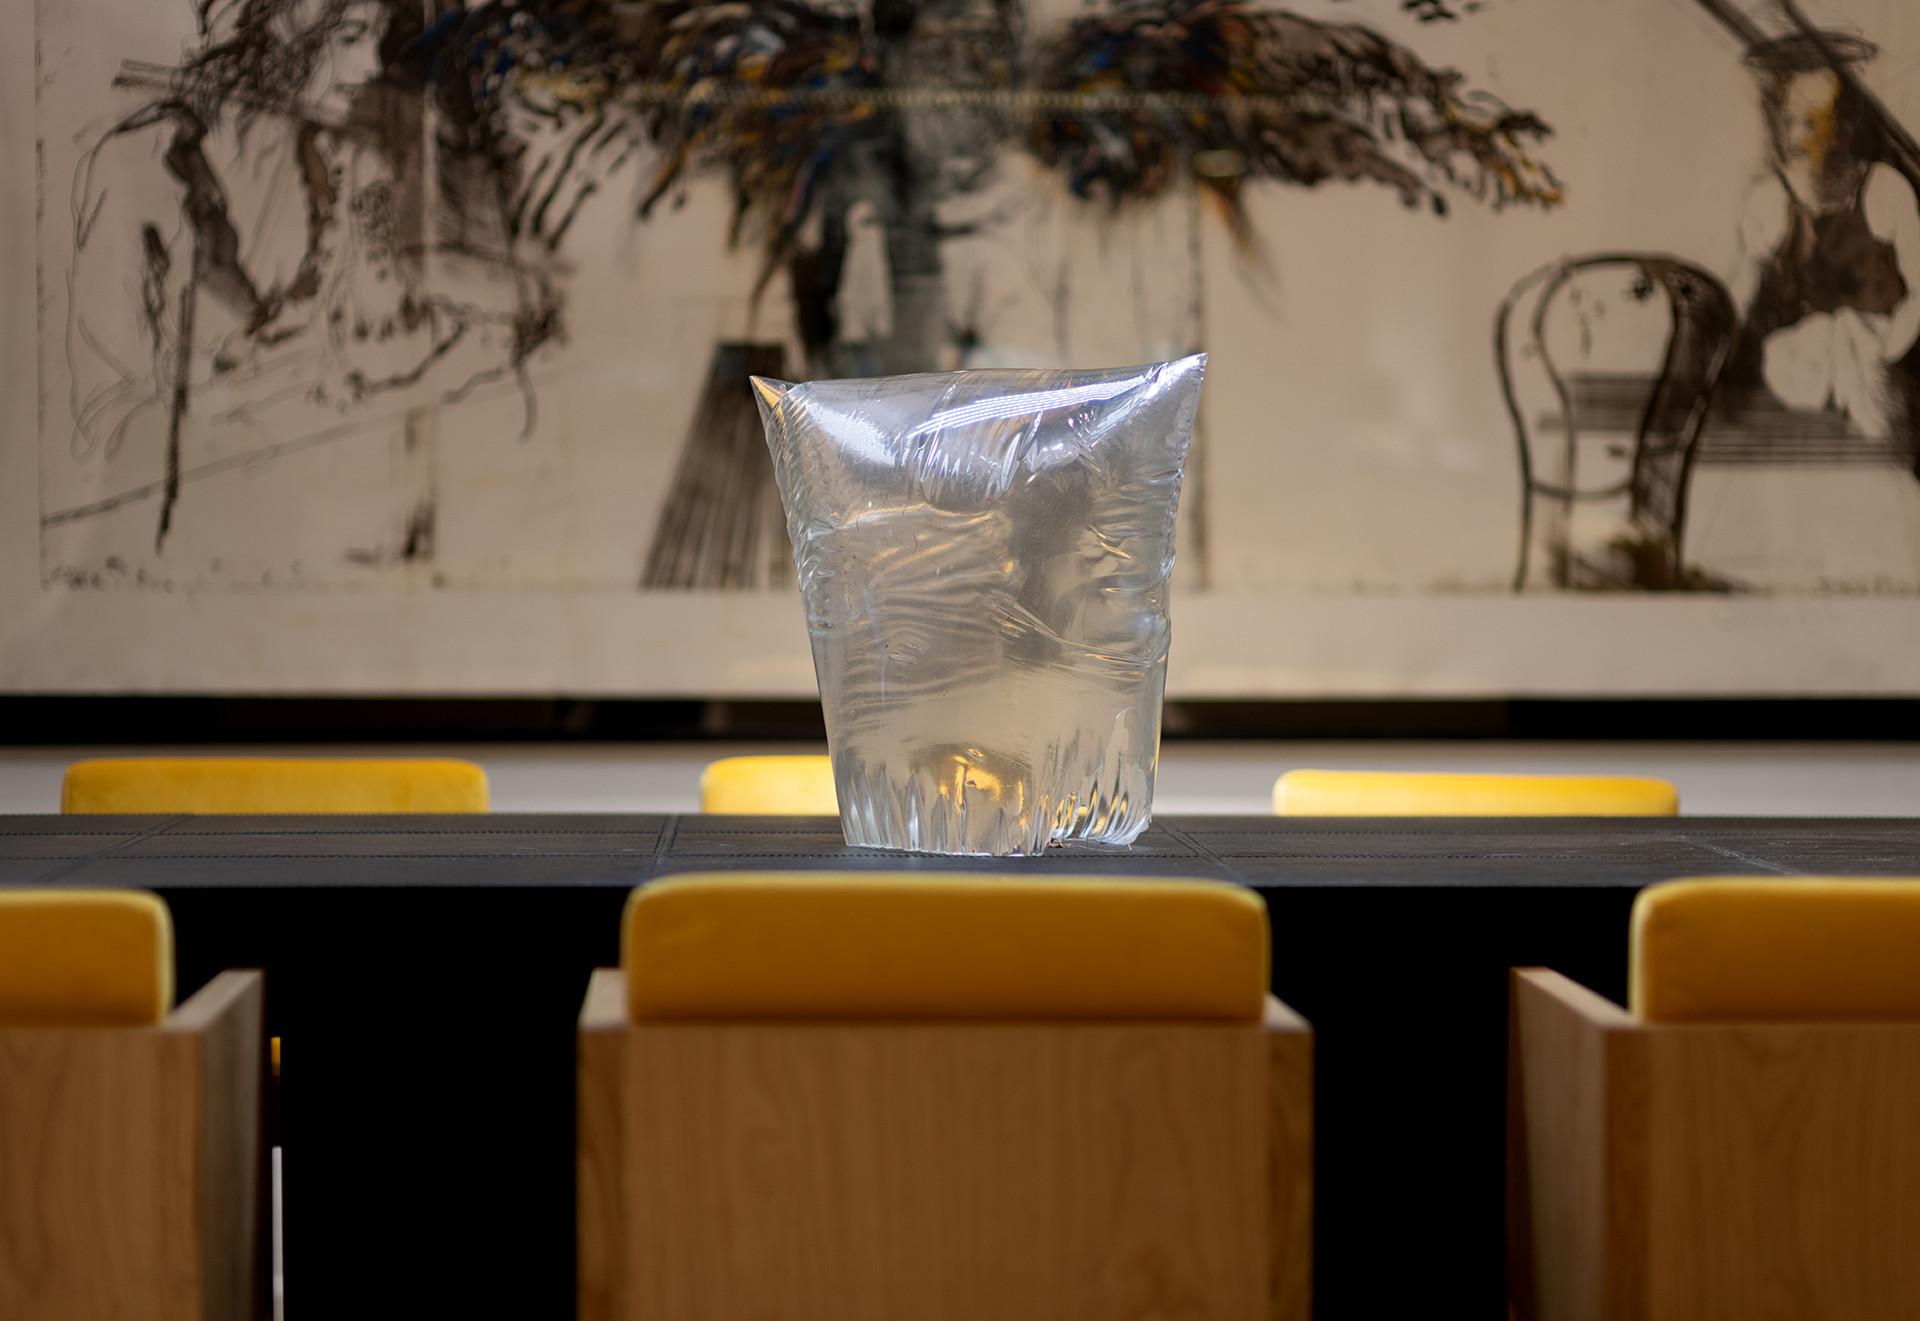 The Box | Studio Alisa Sheinson